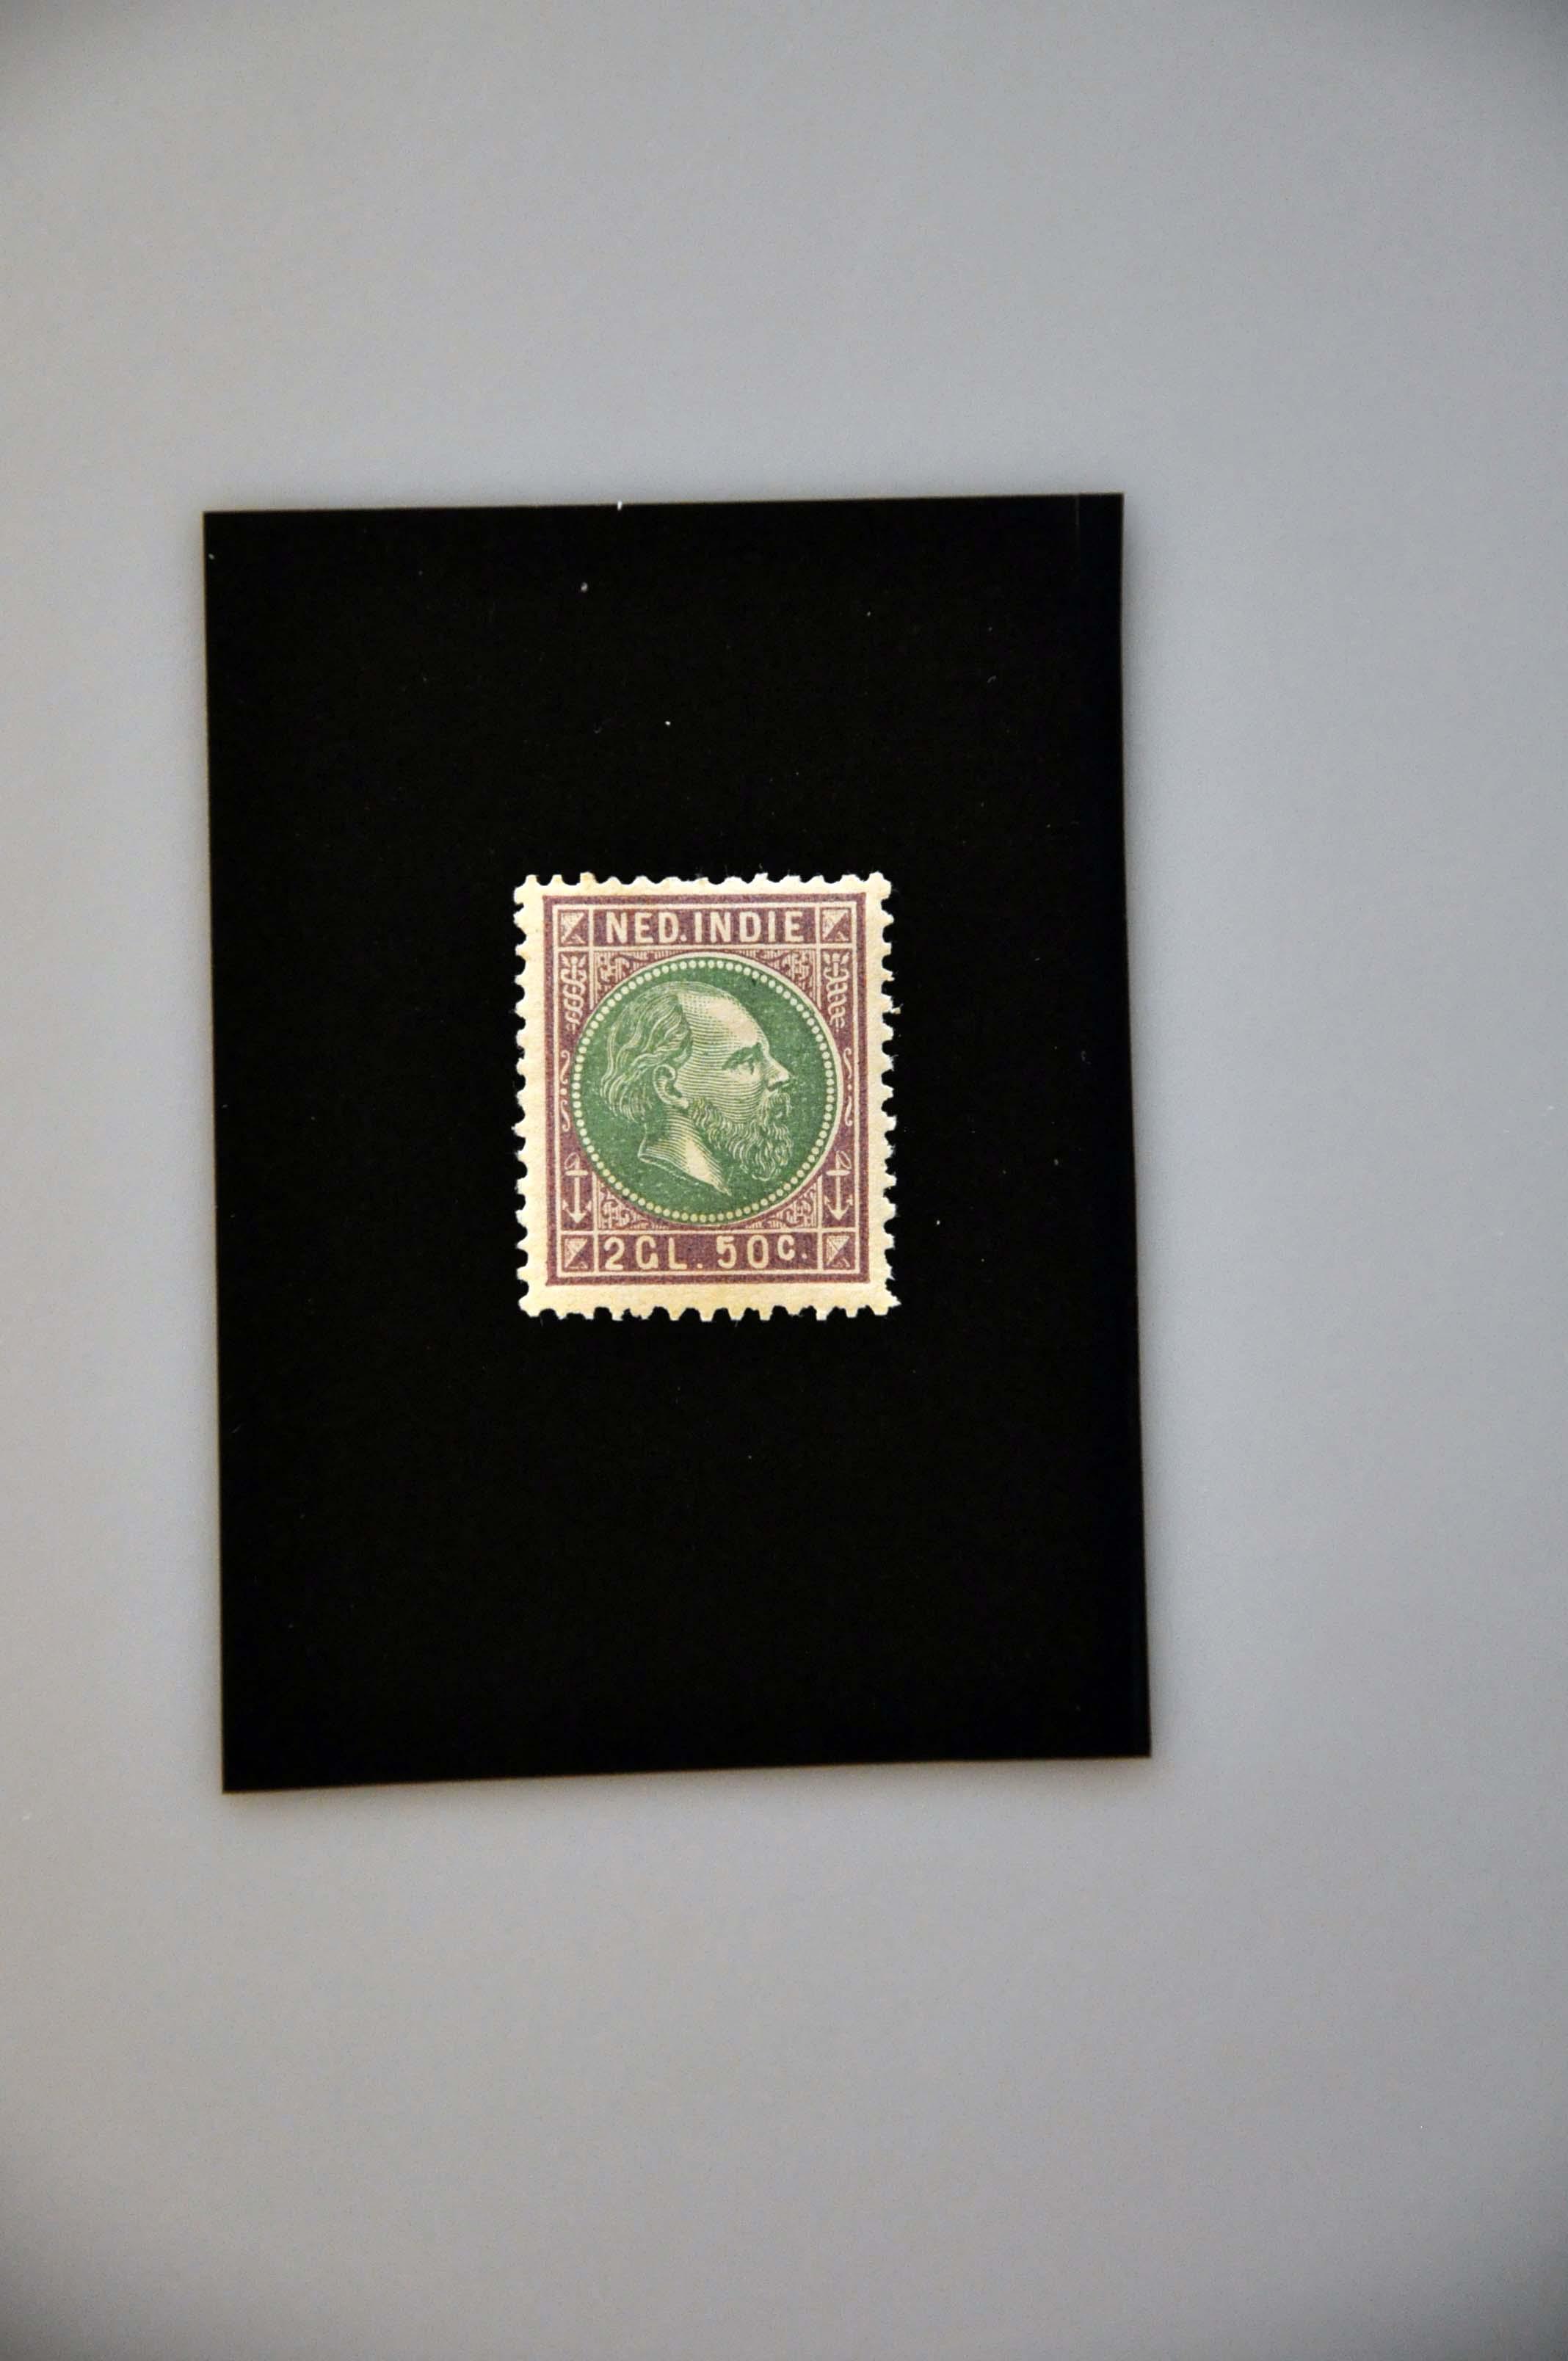 Lot 2161 - Netherlands and former colonies Netherlands Indies -  Corinphila Veilingen Auction 239: General sale